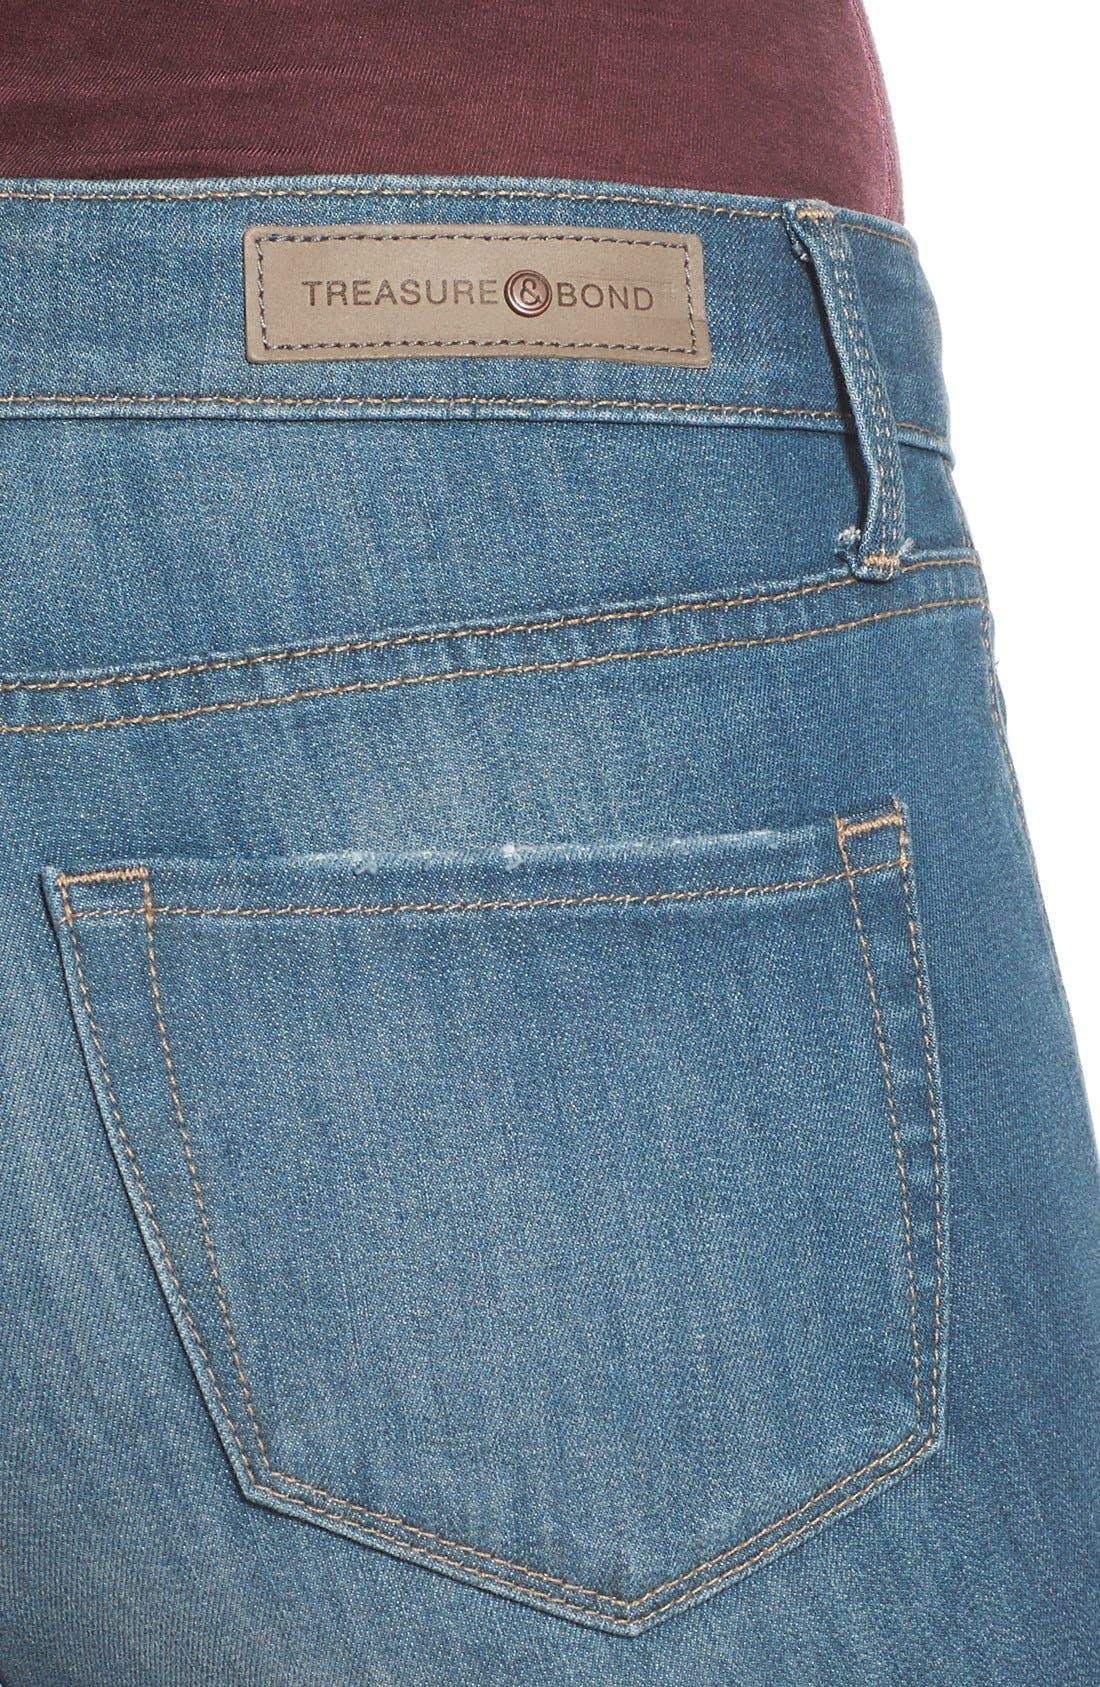 Treasure&Bond High Rise Skinny Flare Jeans,                             Alternate thumbnail 6, color,                             400